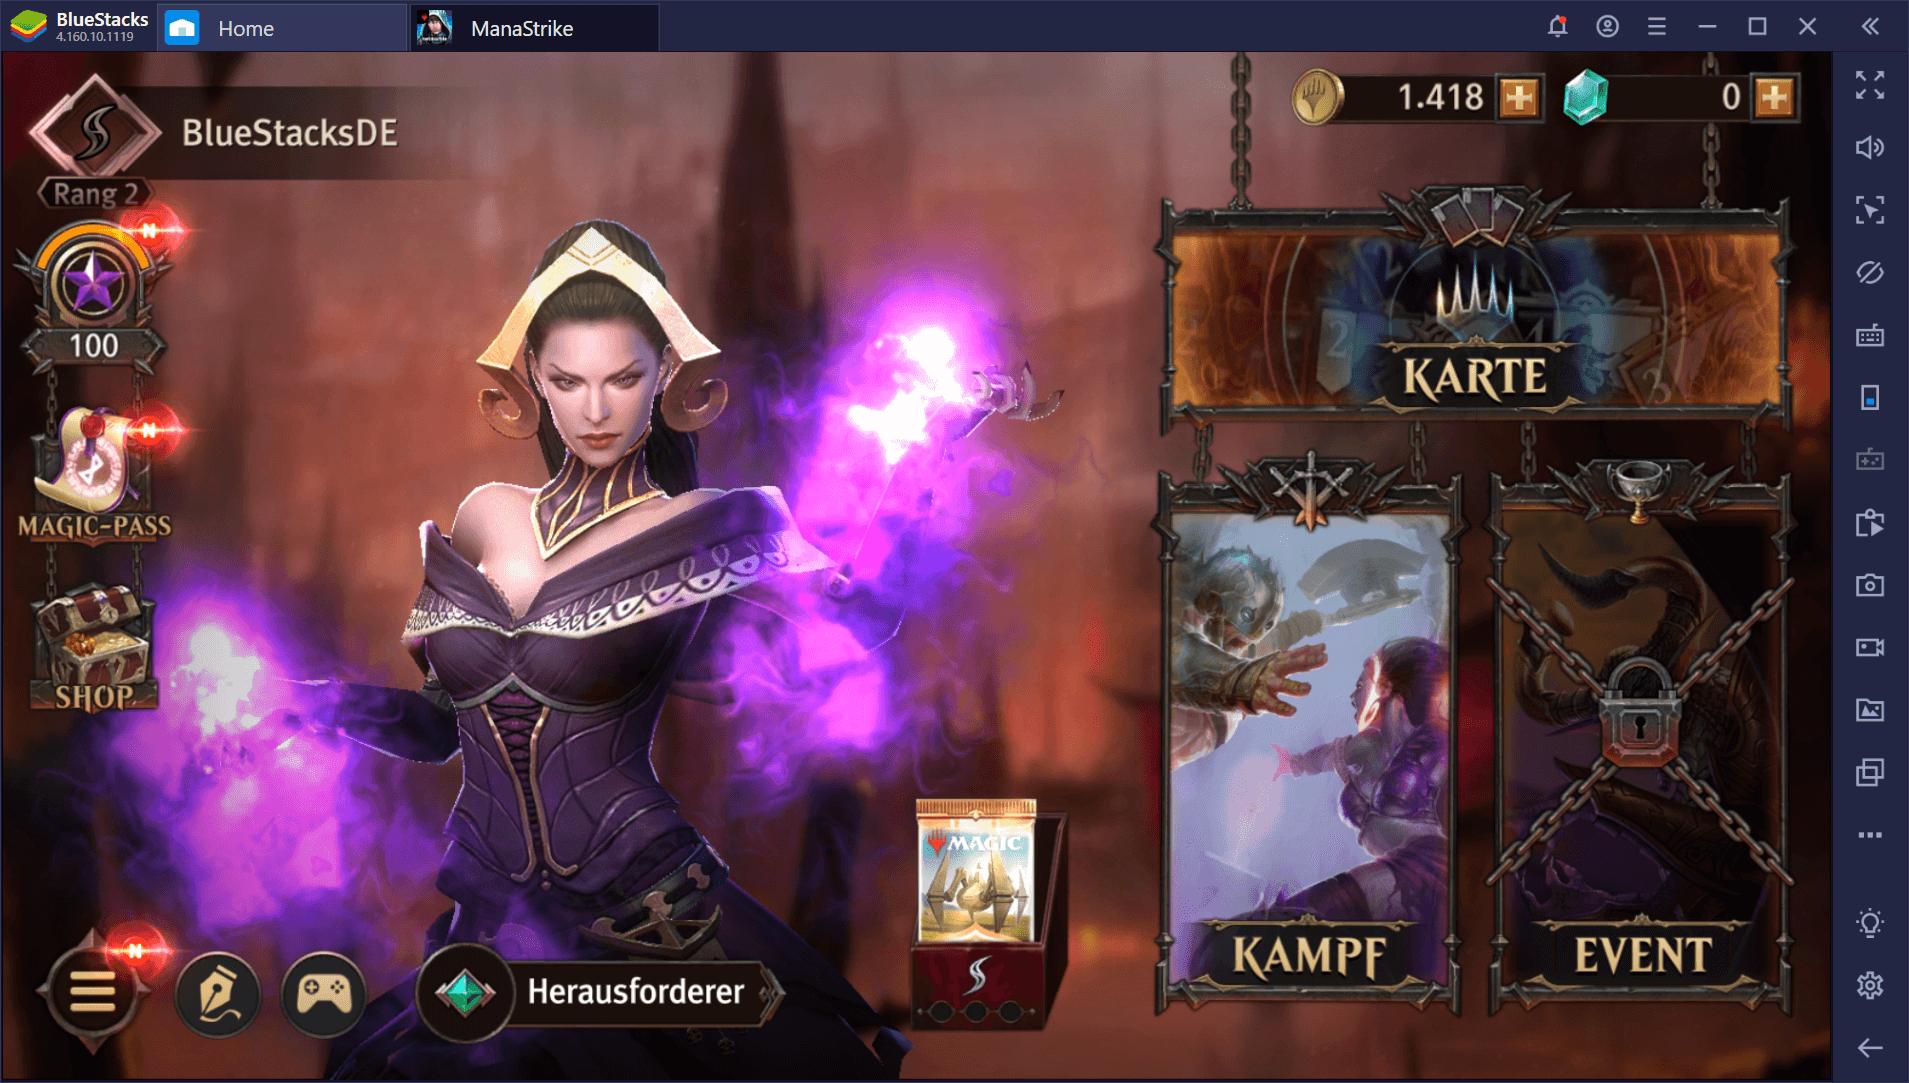 So spielst du Magic: ManaStrike auf BlueStacks